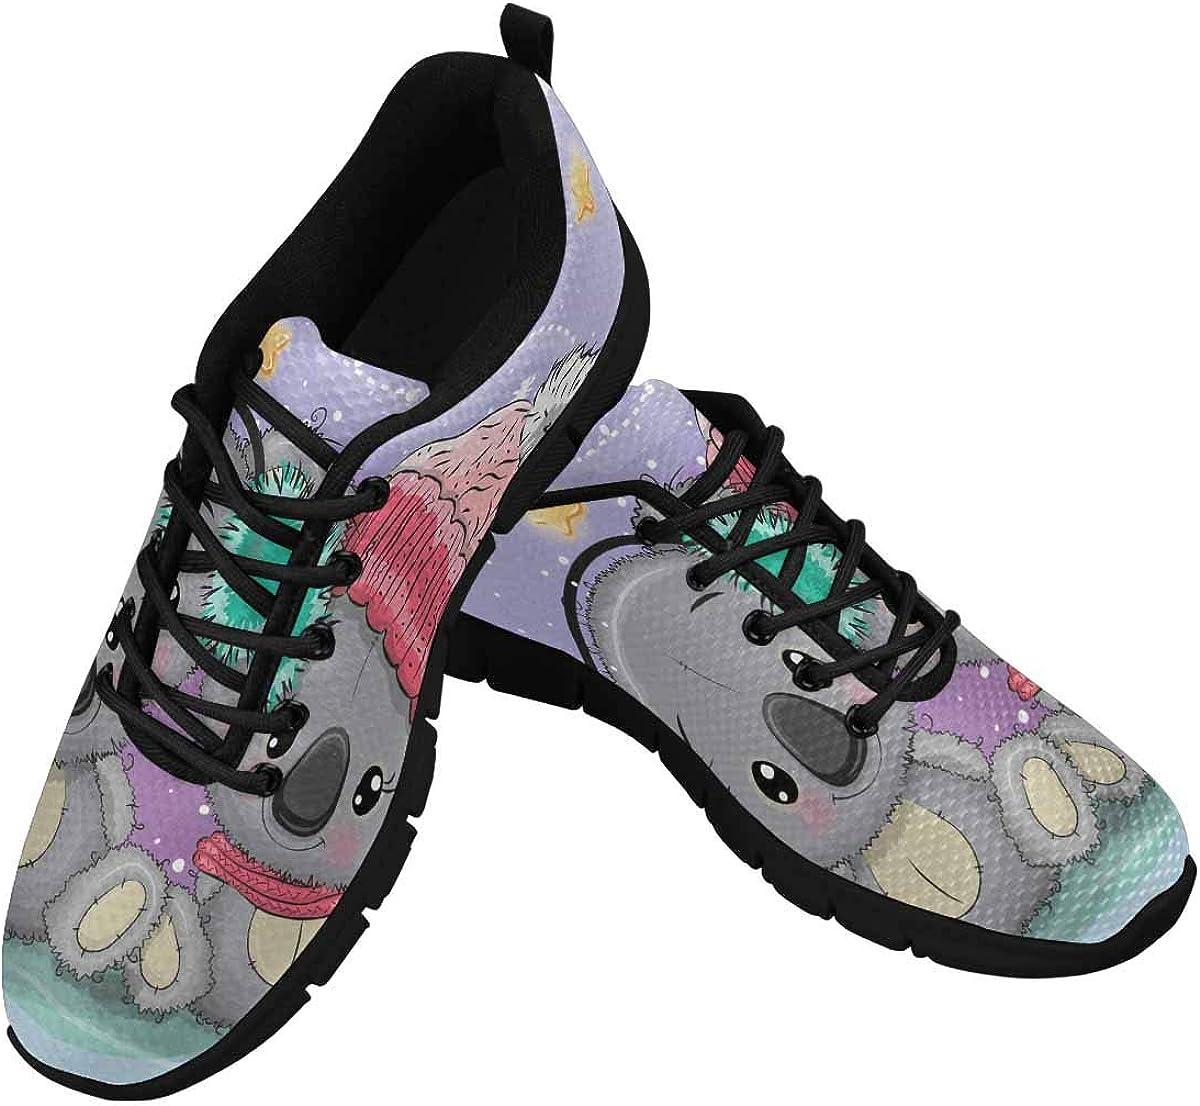 INTERESTPRINT Koalas Lovers Women Walking Shoes Comfortable Lightweight Work Casual Travel Sneakers